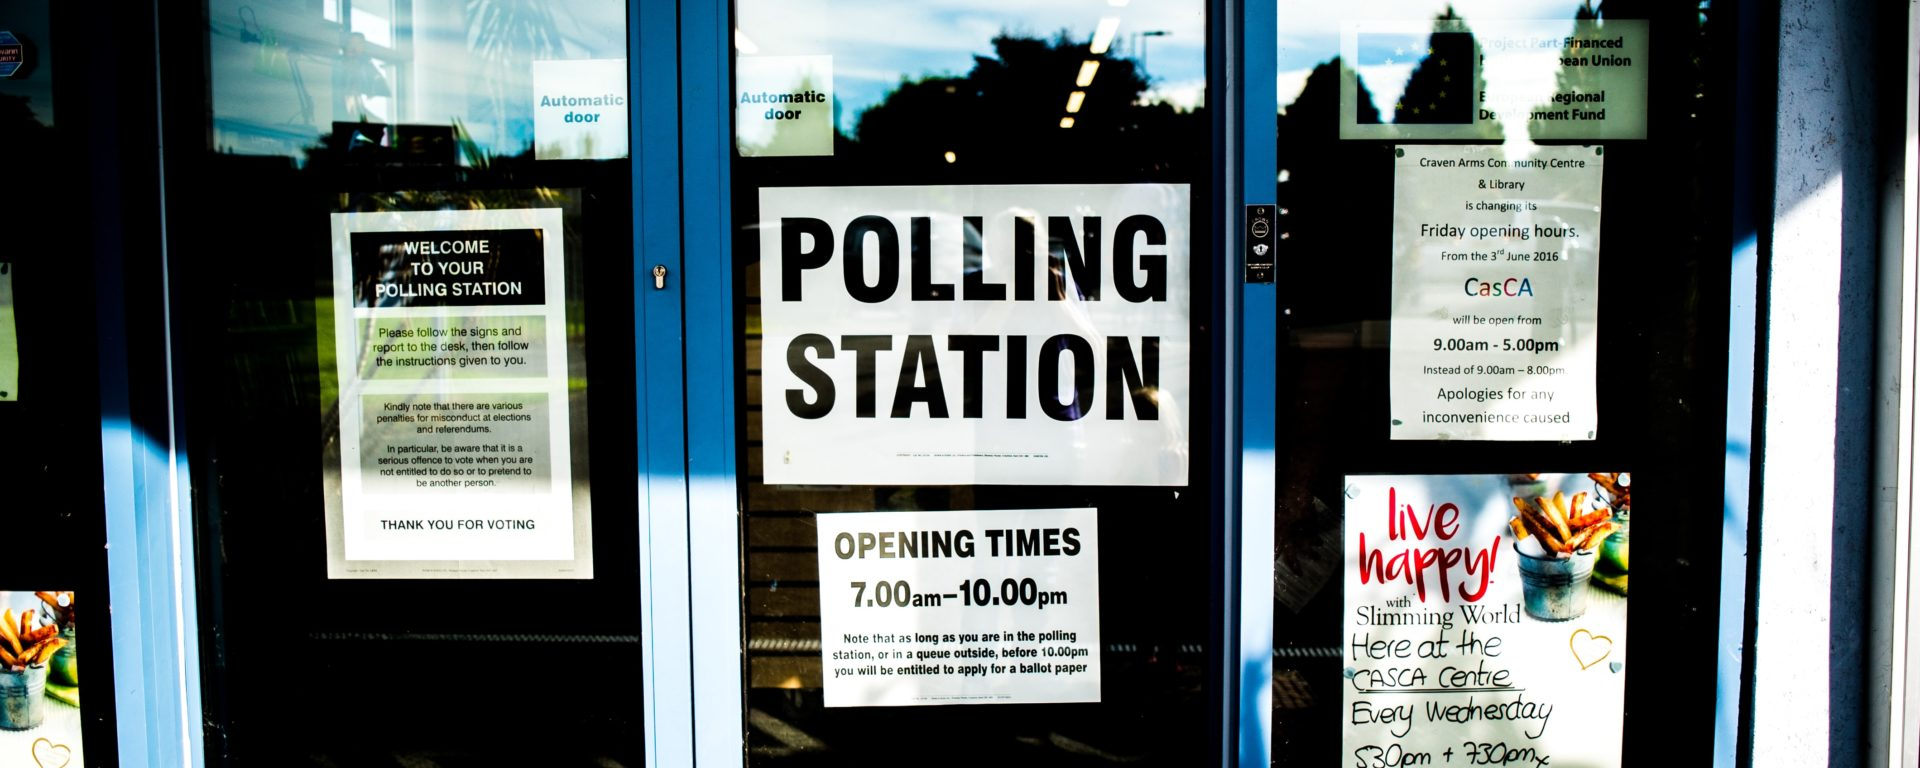 Voting Esl Conversation Questions And Speaking Activities